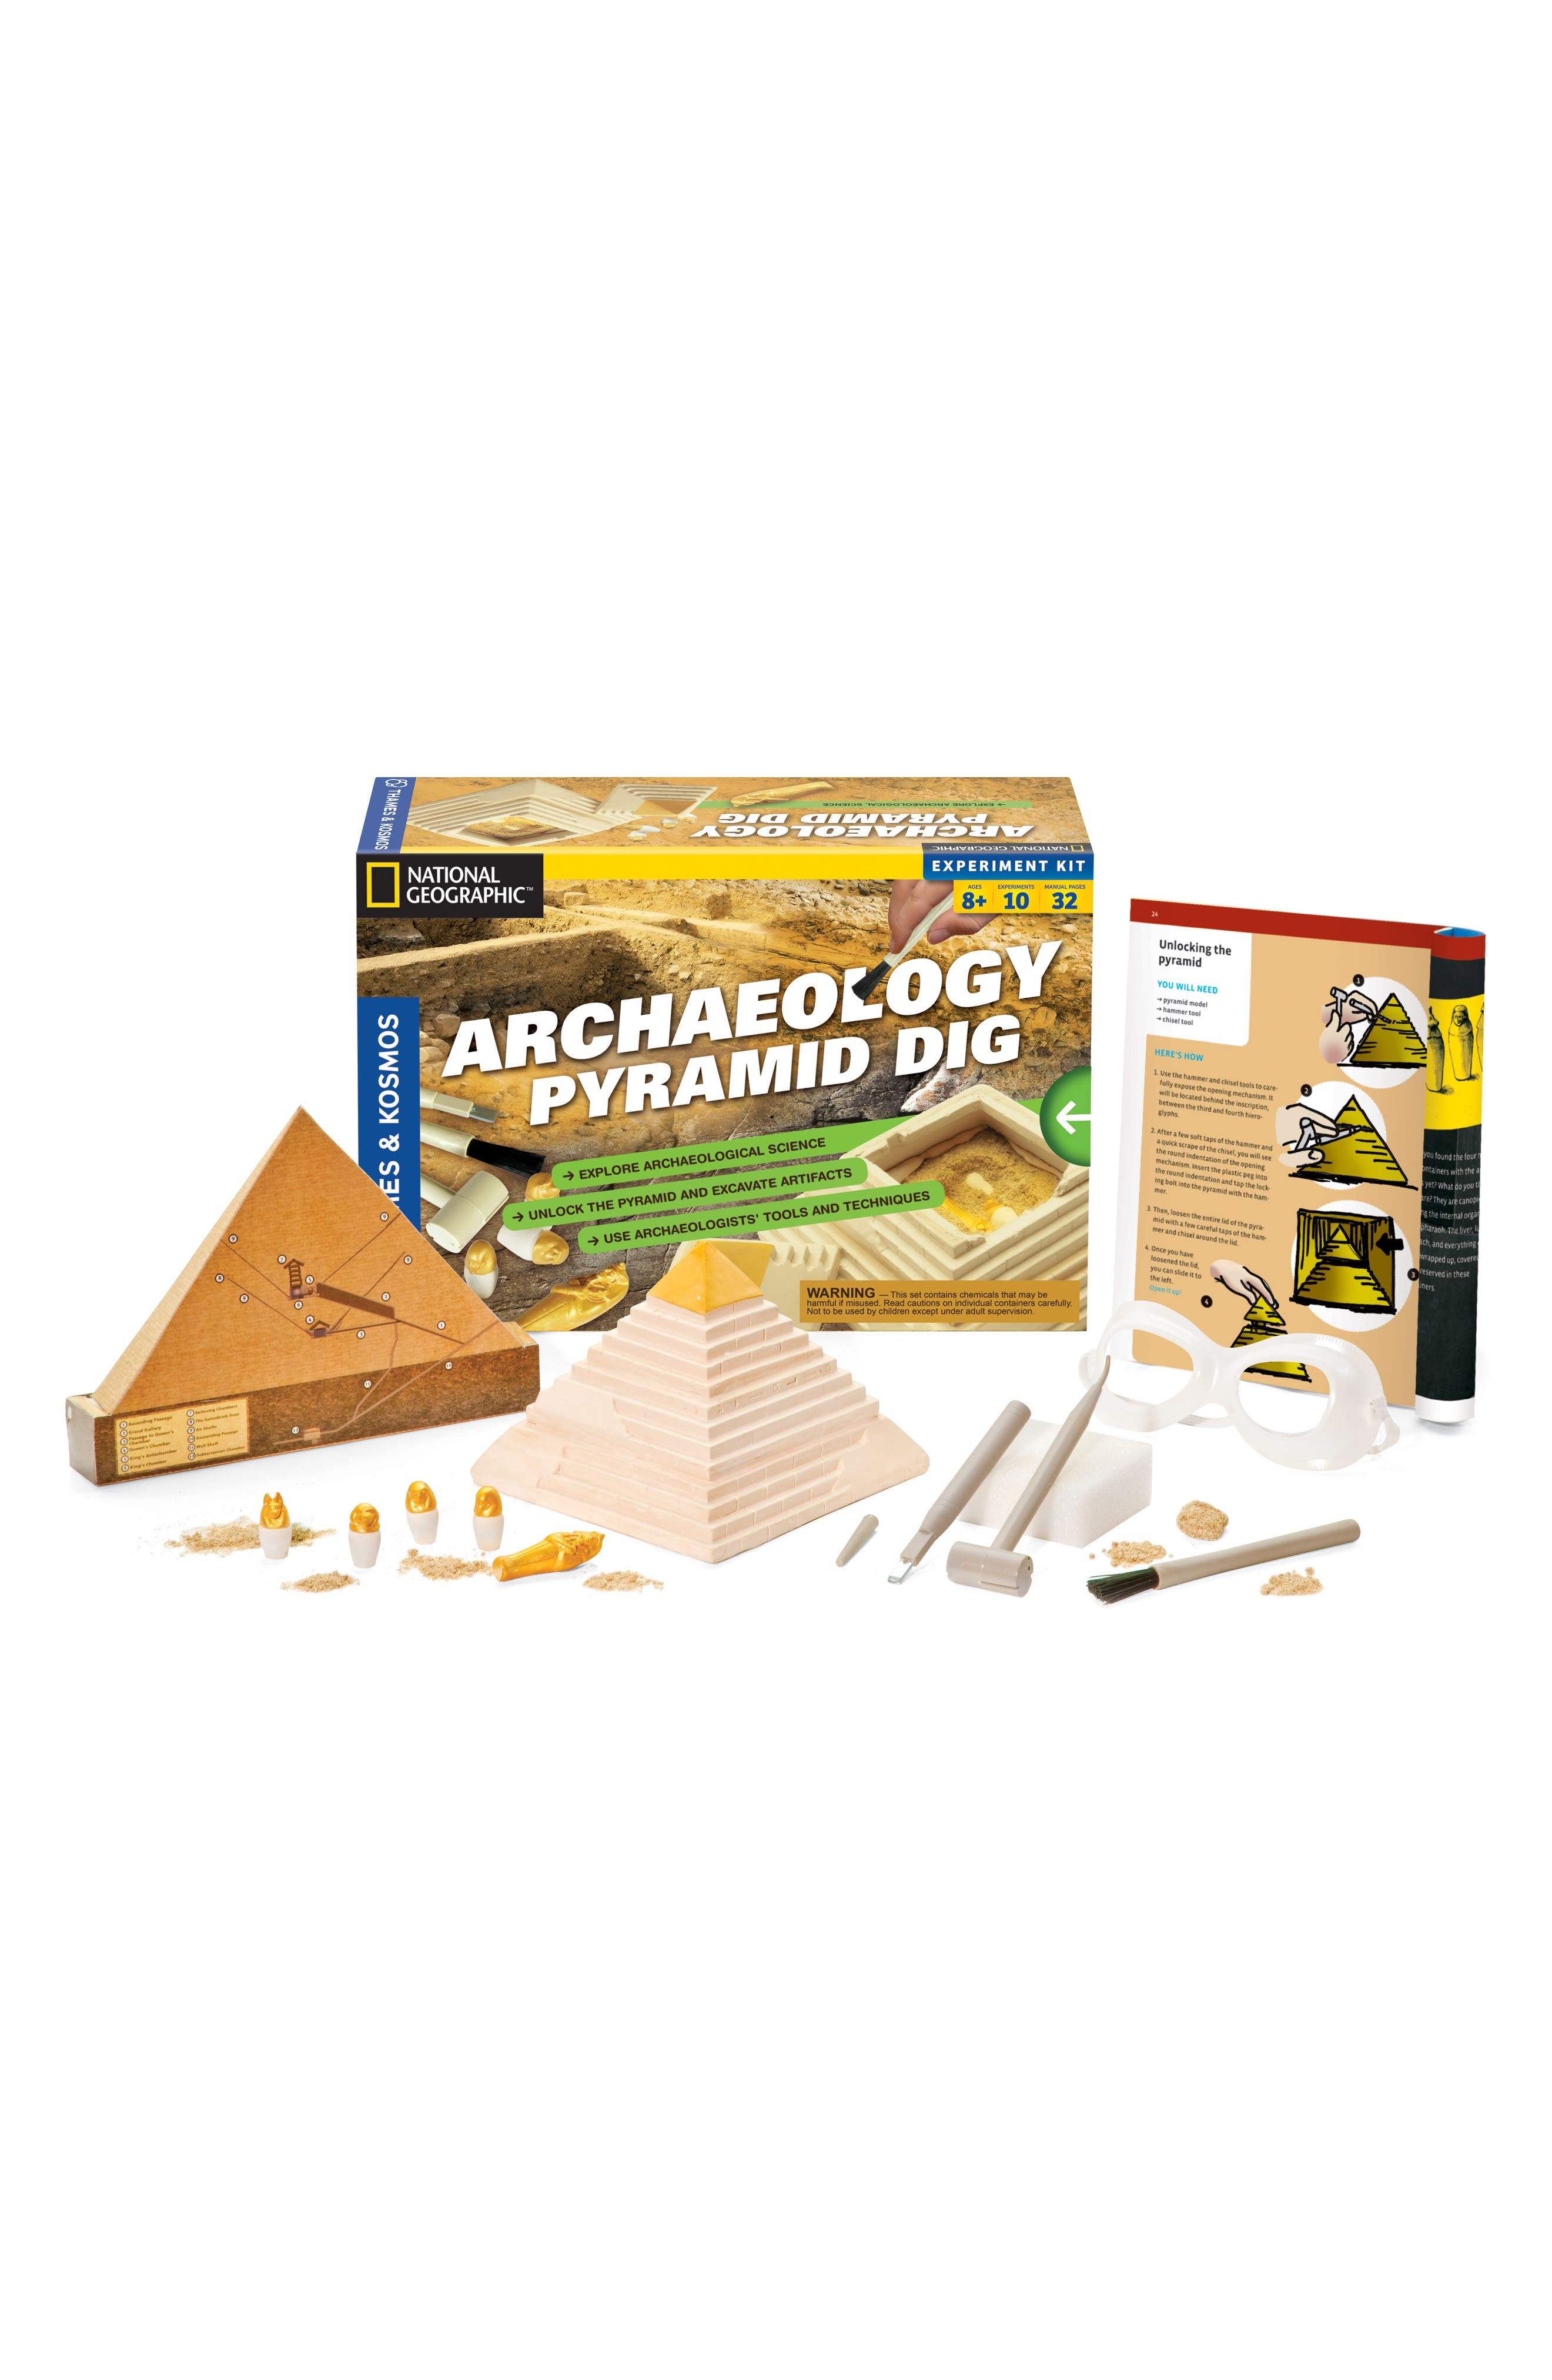 'Archaeology: Pyramid Dig 2.0' Play Kit,                             Alternate thumbnail 2, color,                             000